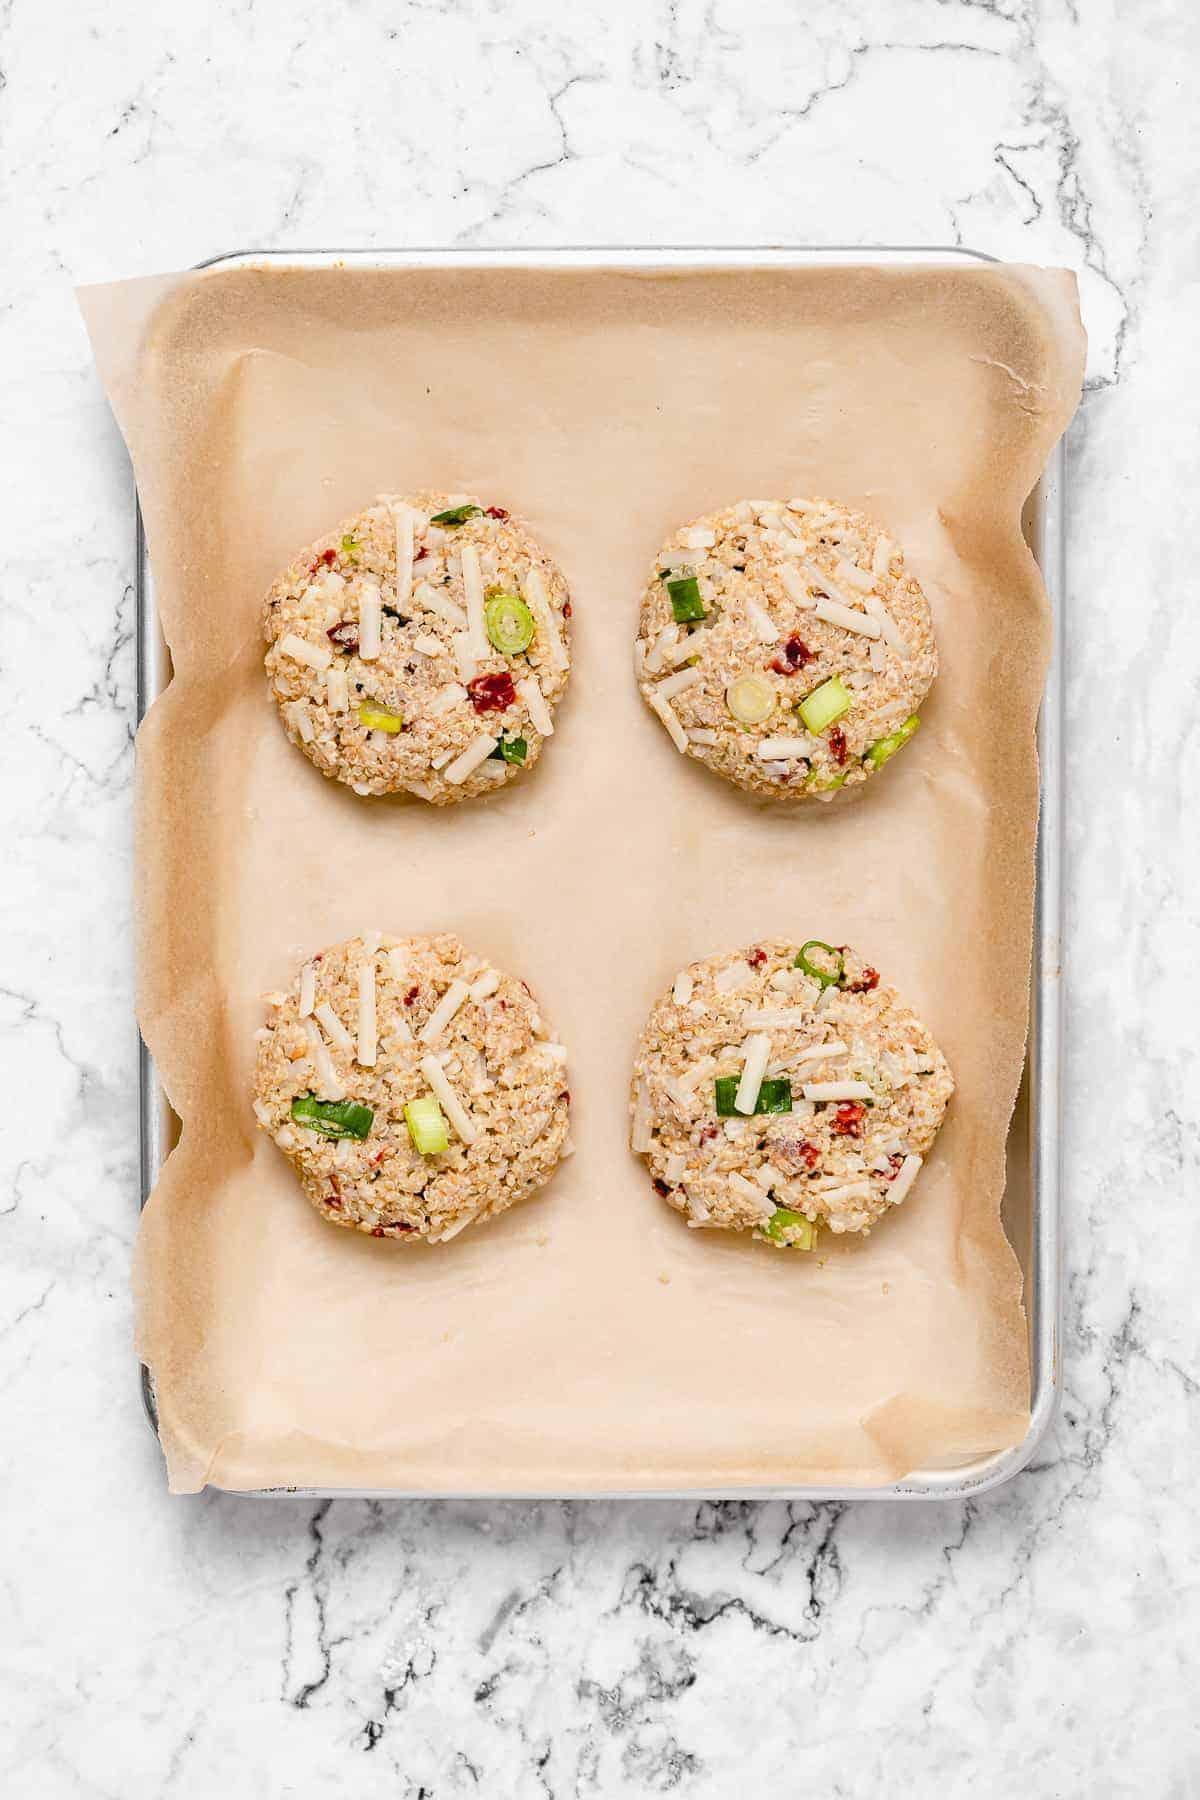 Four quinoa veggie burger patties on a baking sheet with parchment paper